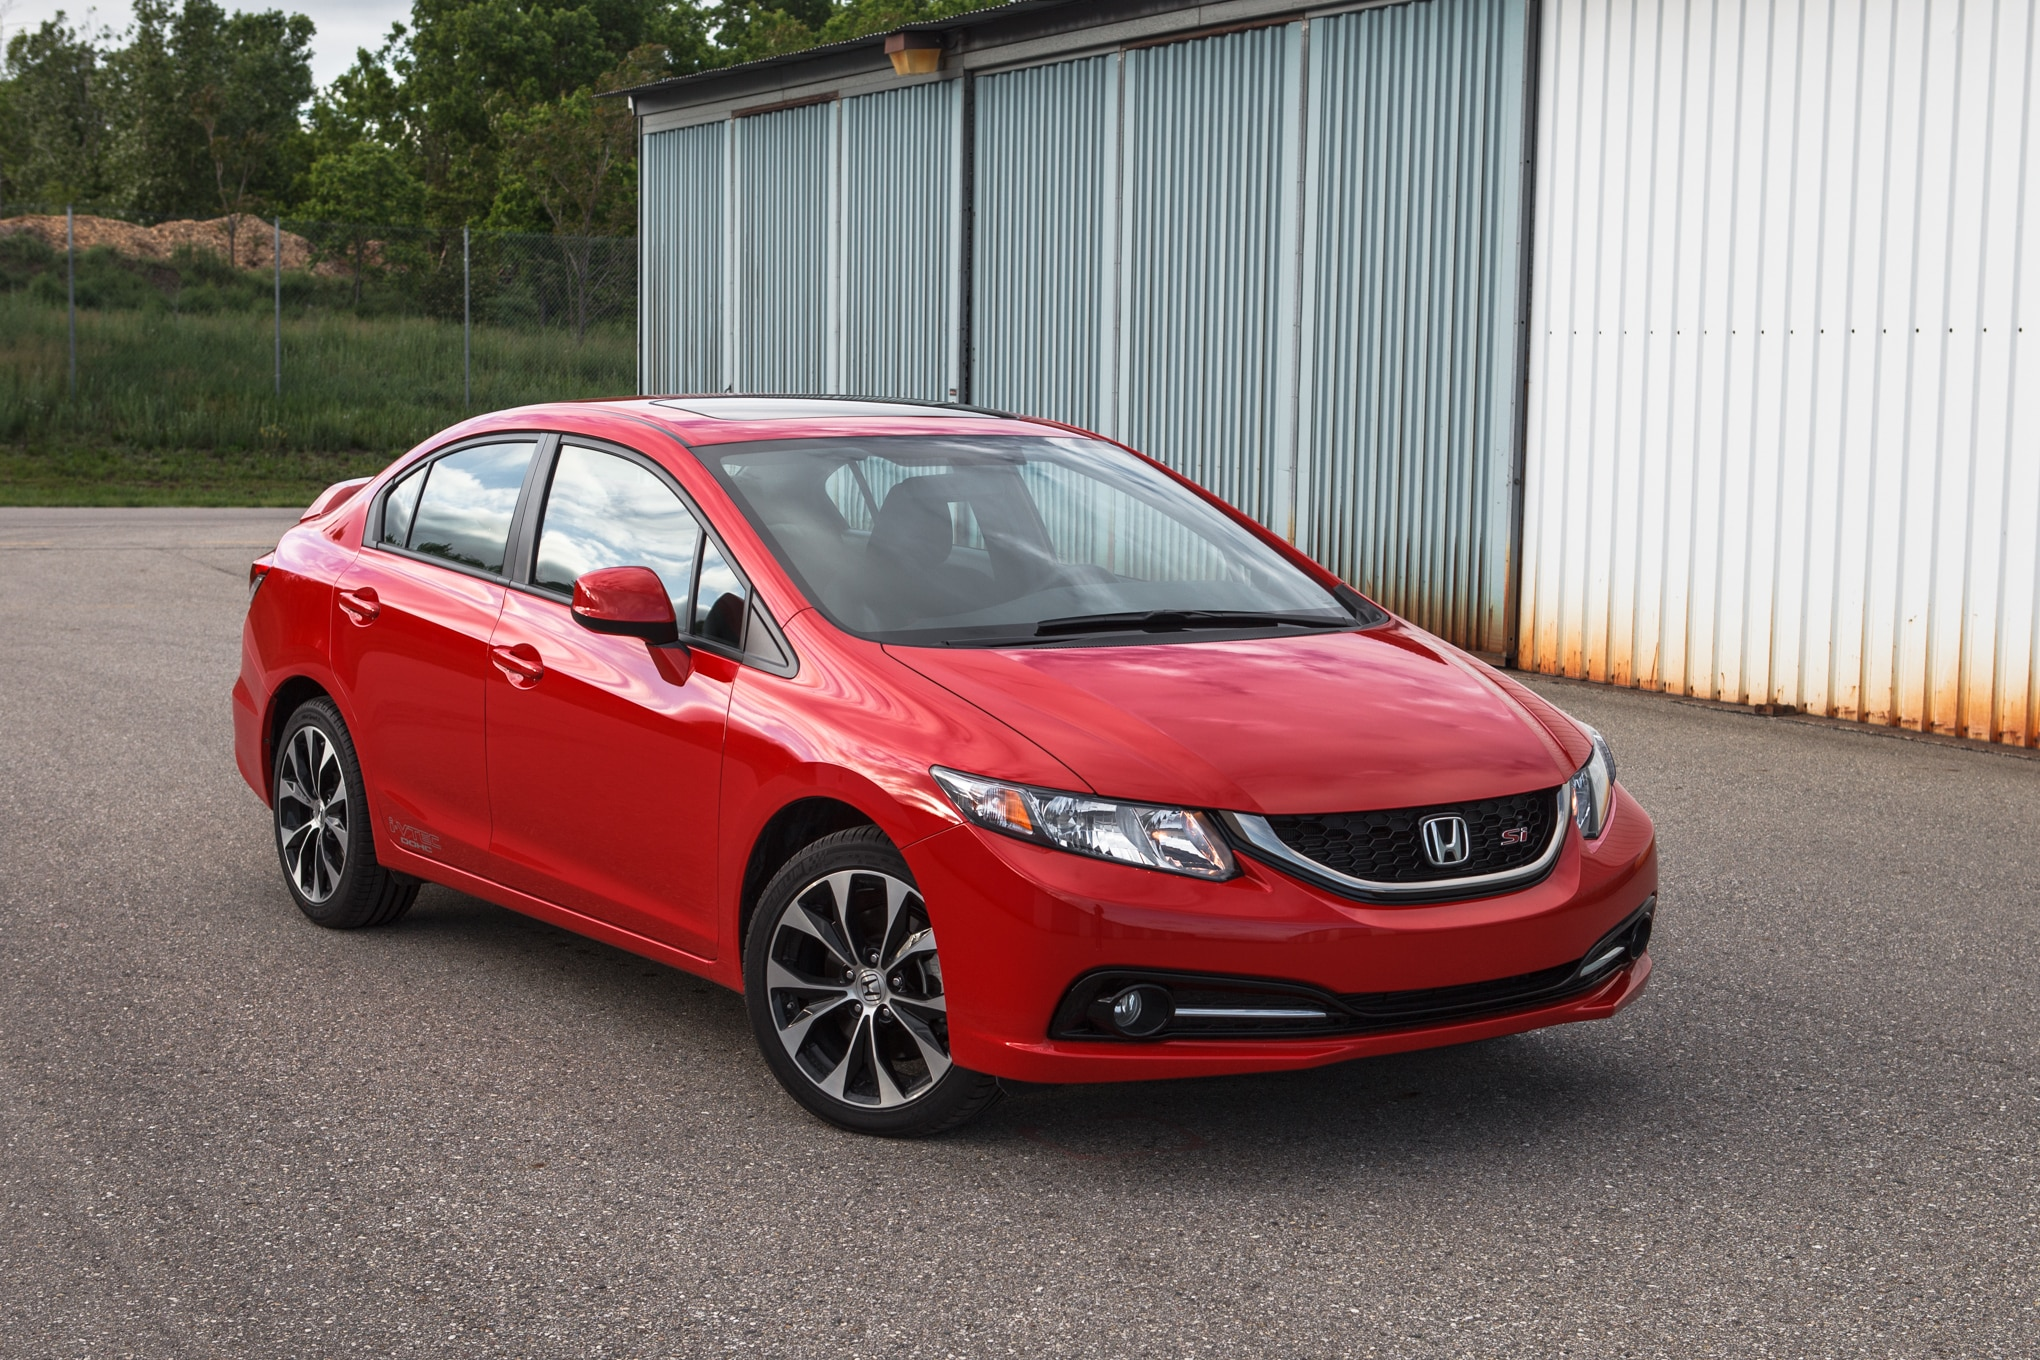 2013 Honda Civic Si Front Right View 21